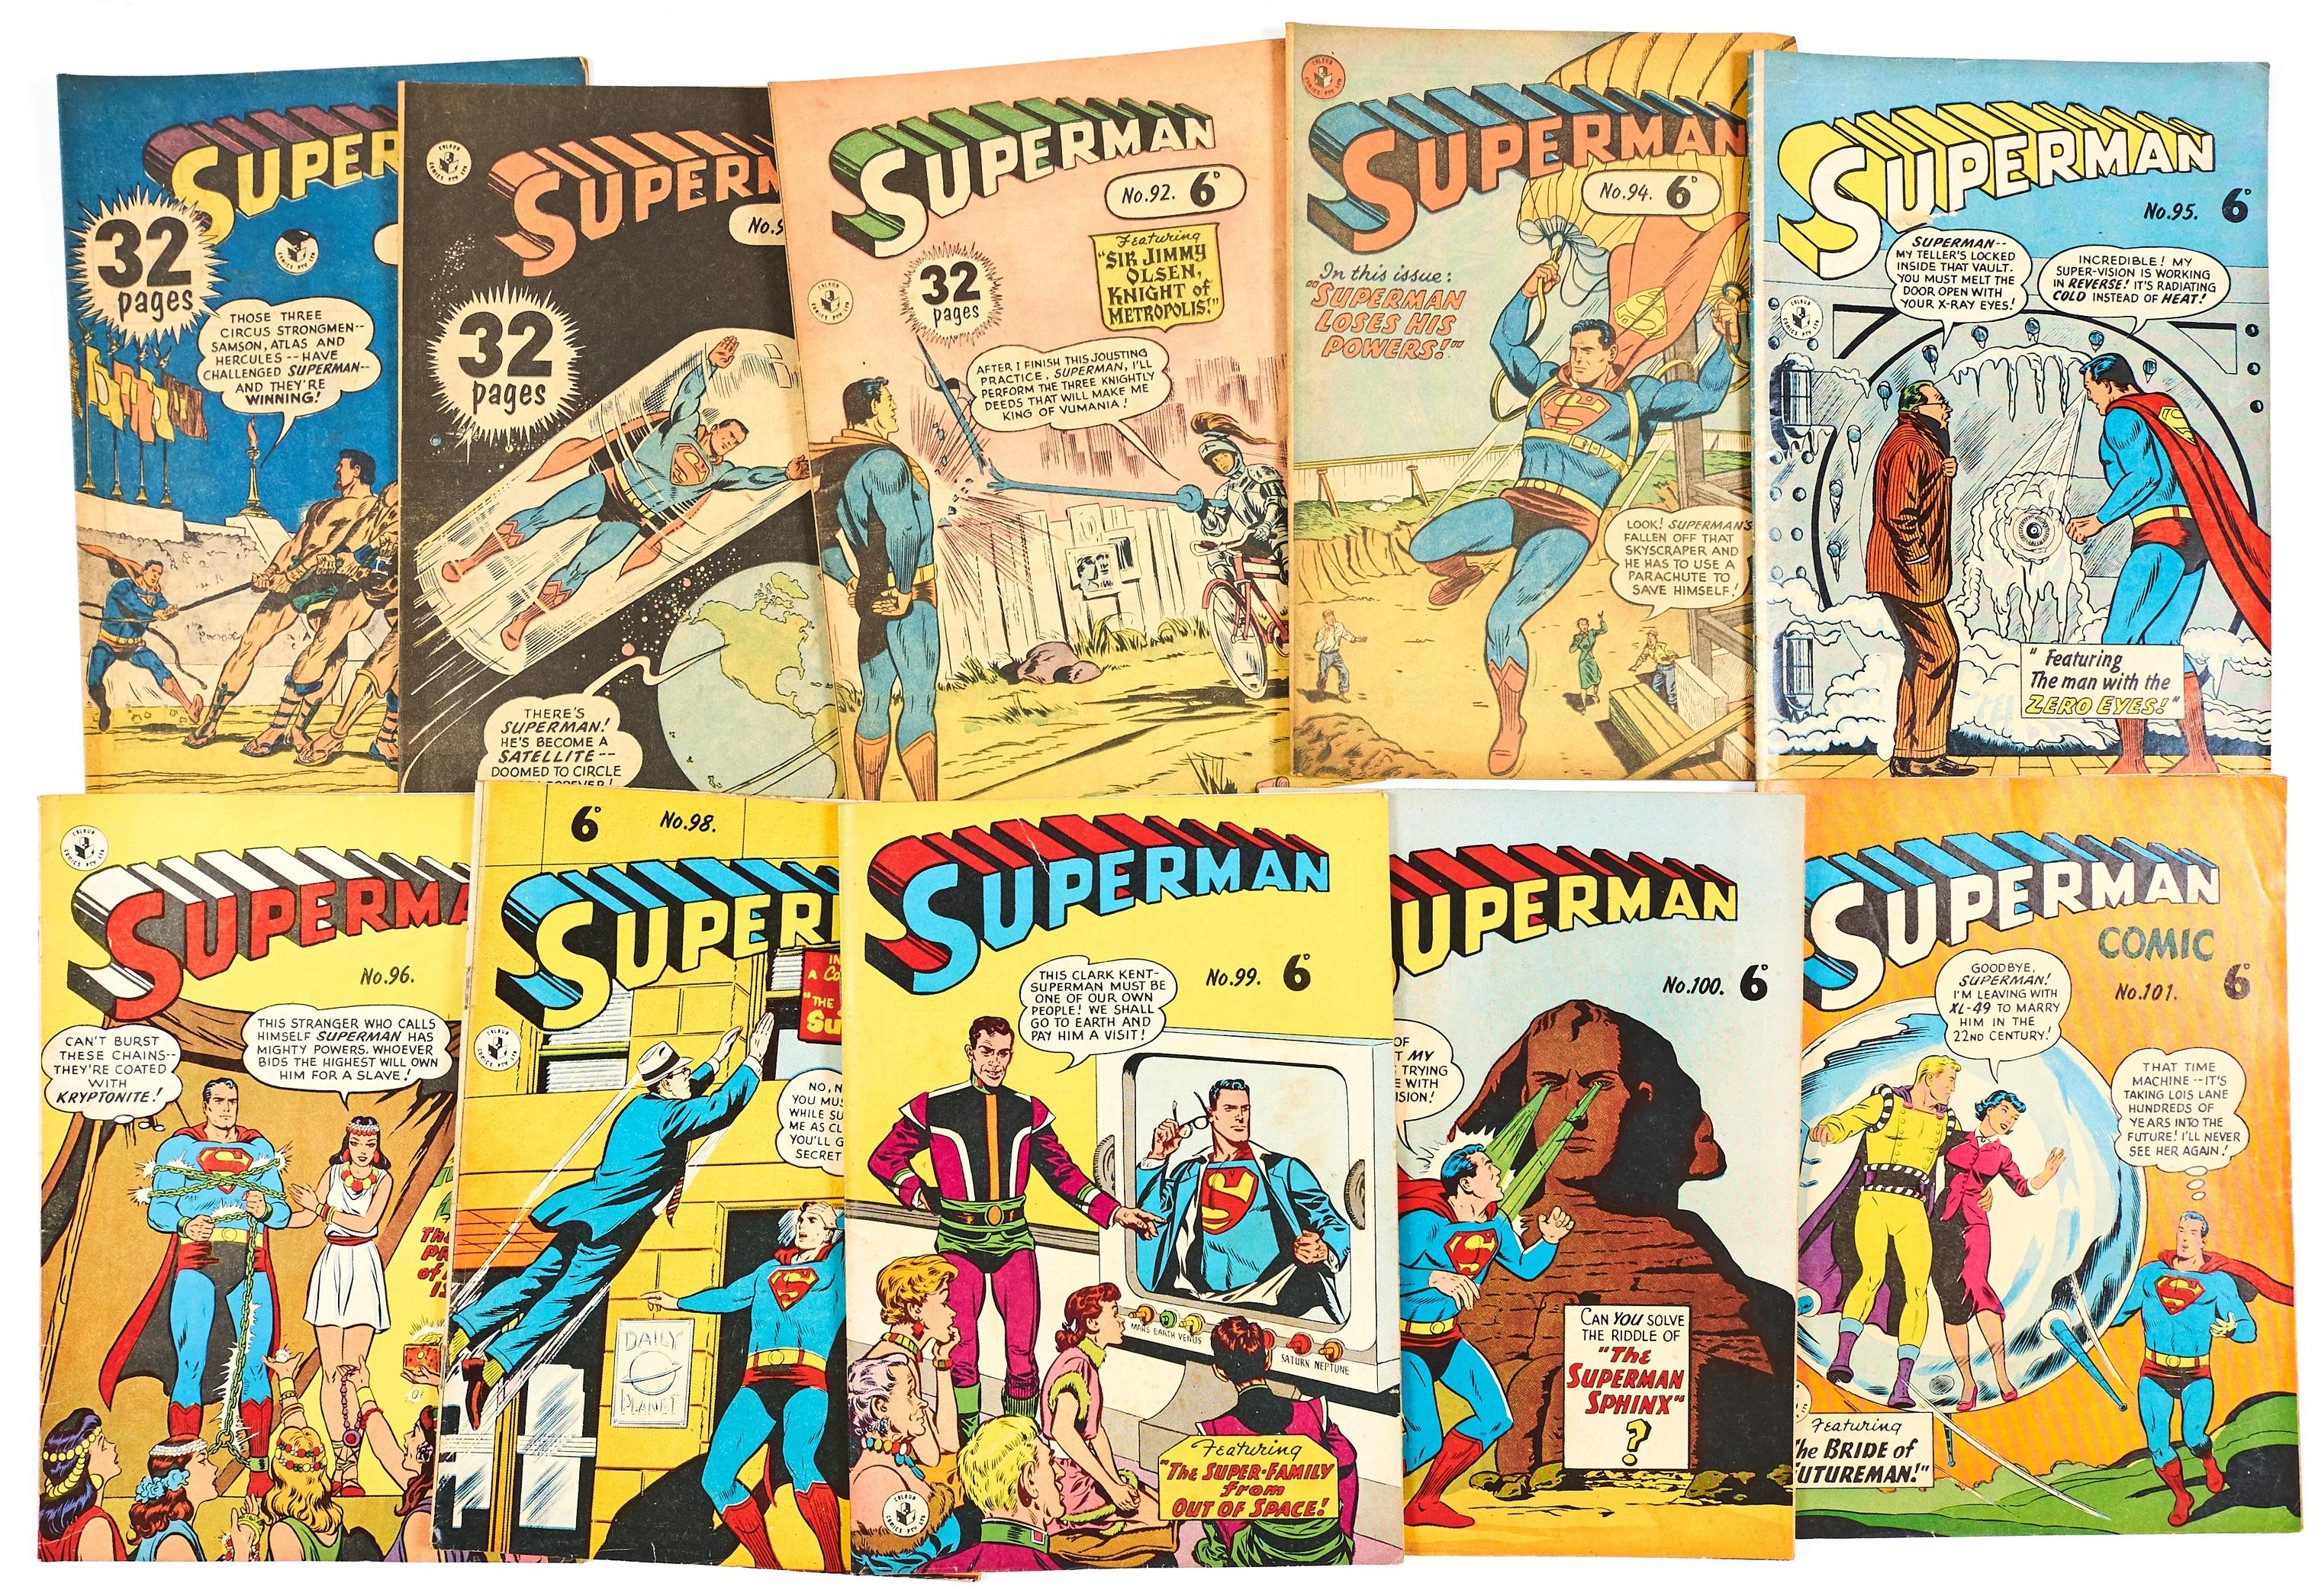 Lot 39 - Superman Australian reprints (1950s). 88, 90, 92, 94-96, 98-101 [vg/fn-] (10)